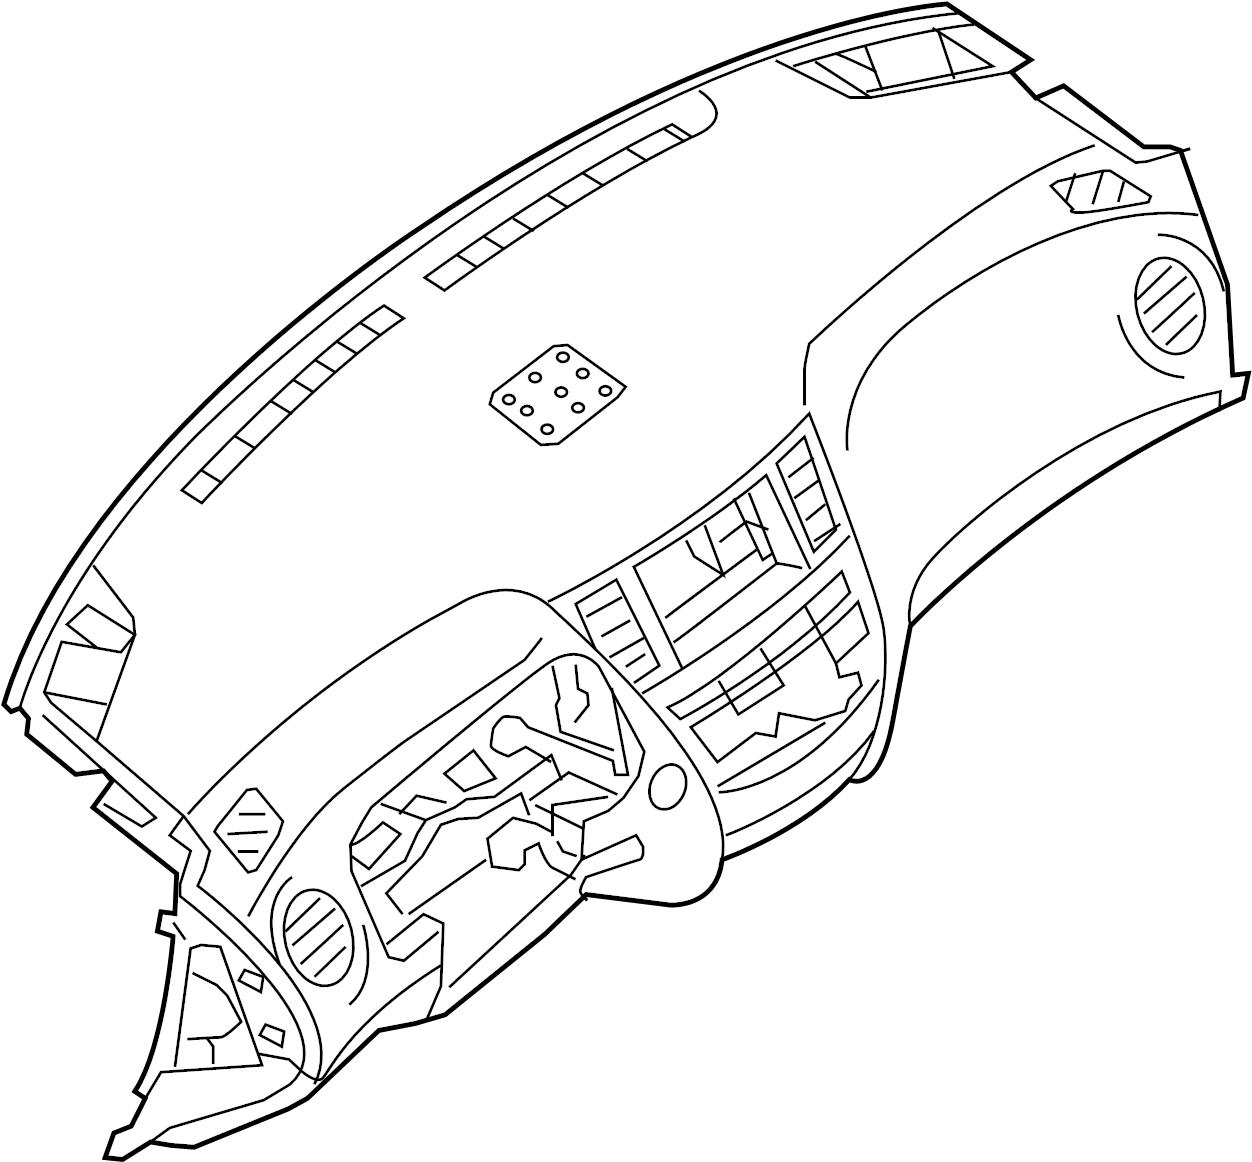 Nissan Pathfinder Dashboard Panel. INST, PAD, CLUSTER